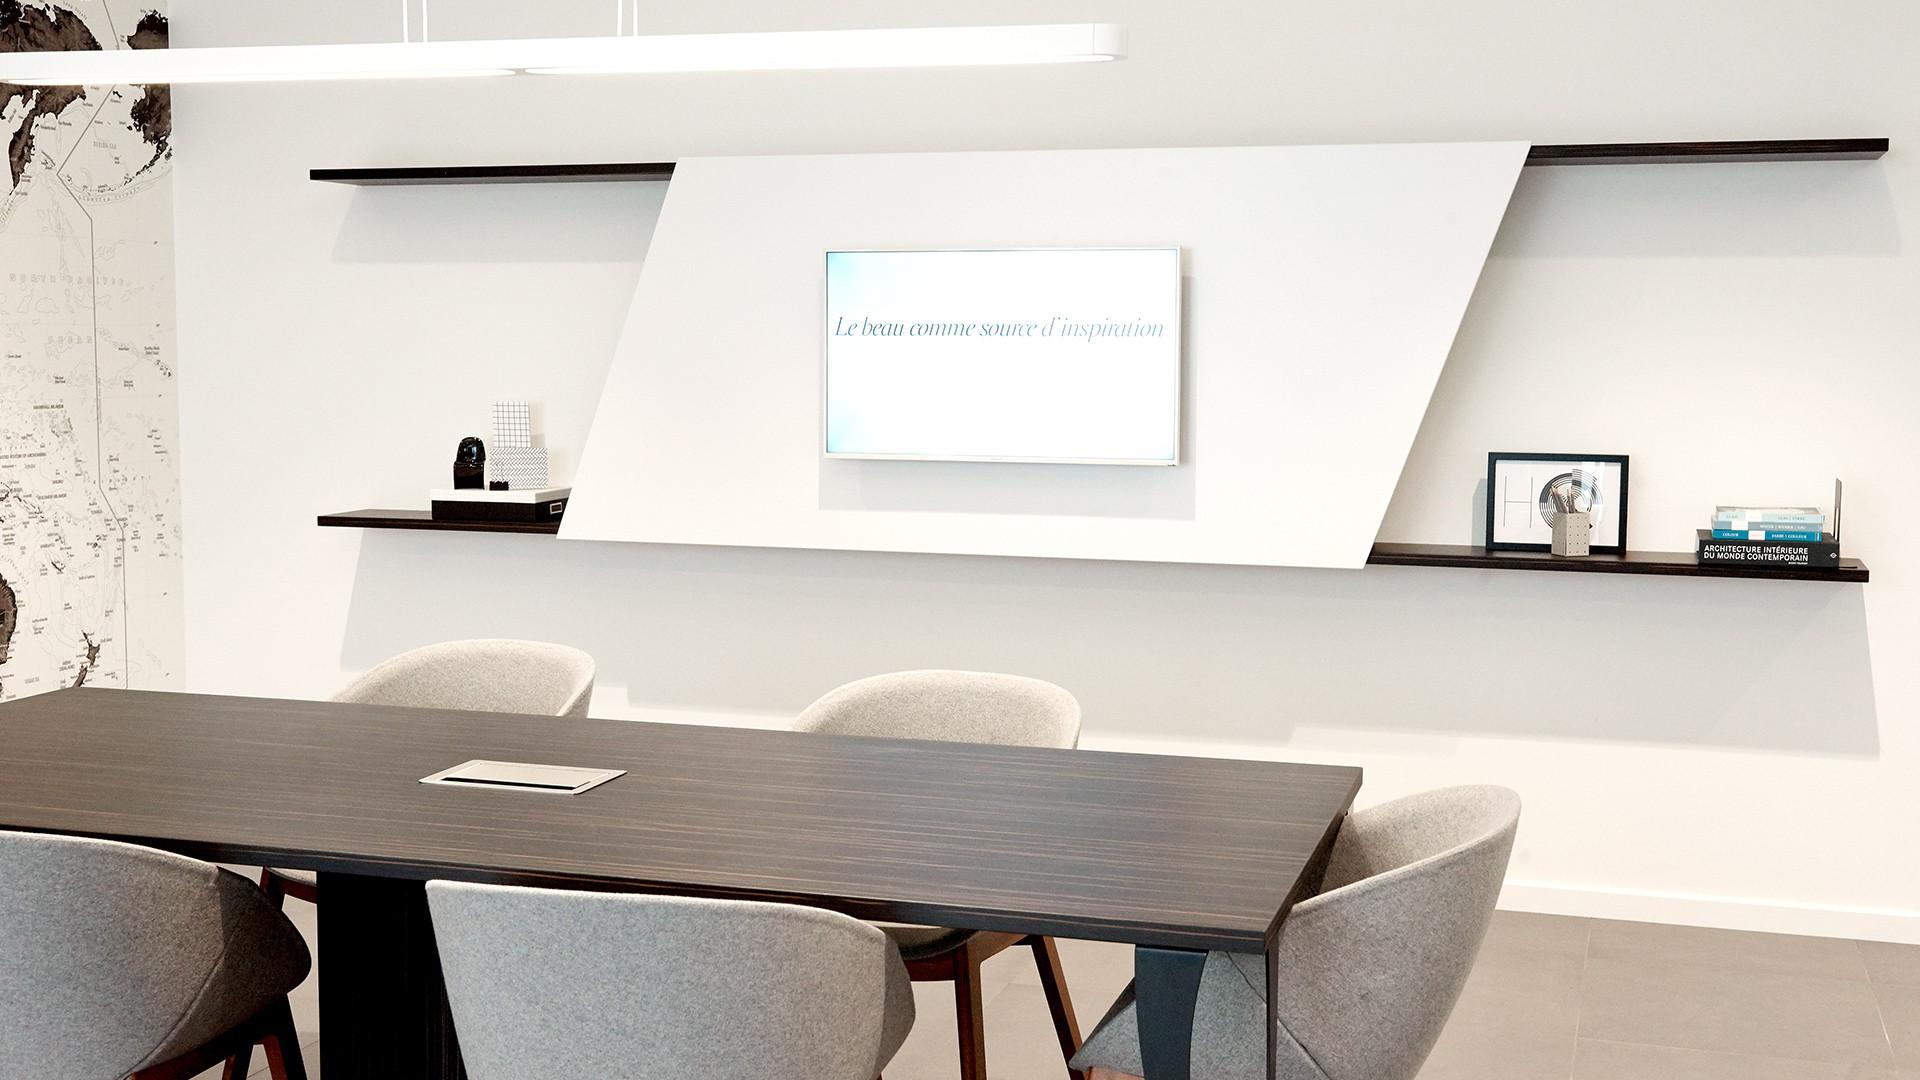 salle de r union en b ne de macassar hubler. Black Bedroom Furniture Sets. Home Design Ideas